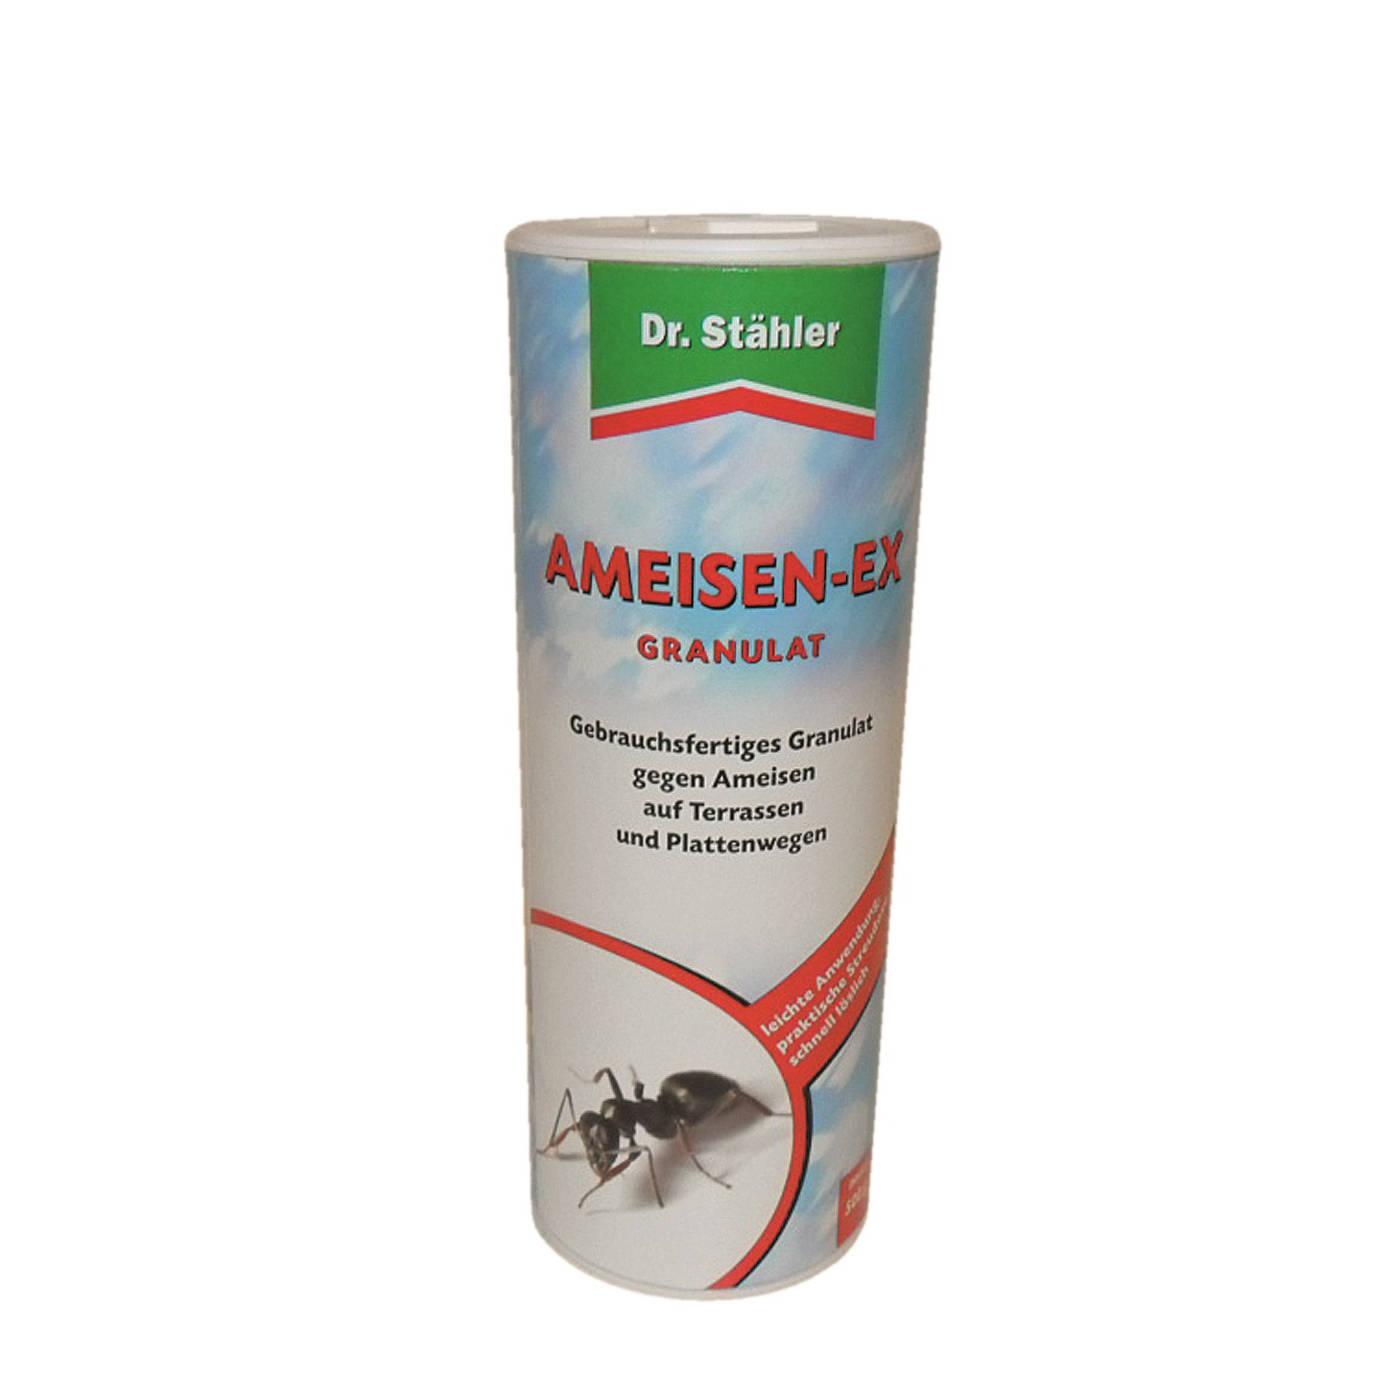 Dr. Stähler Ameisen-Ex Granulat 250 g